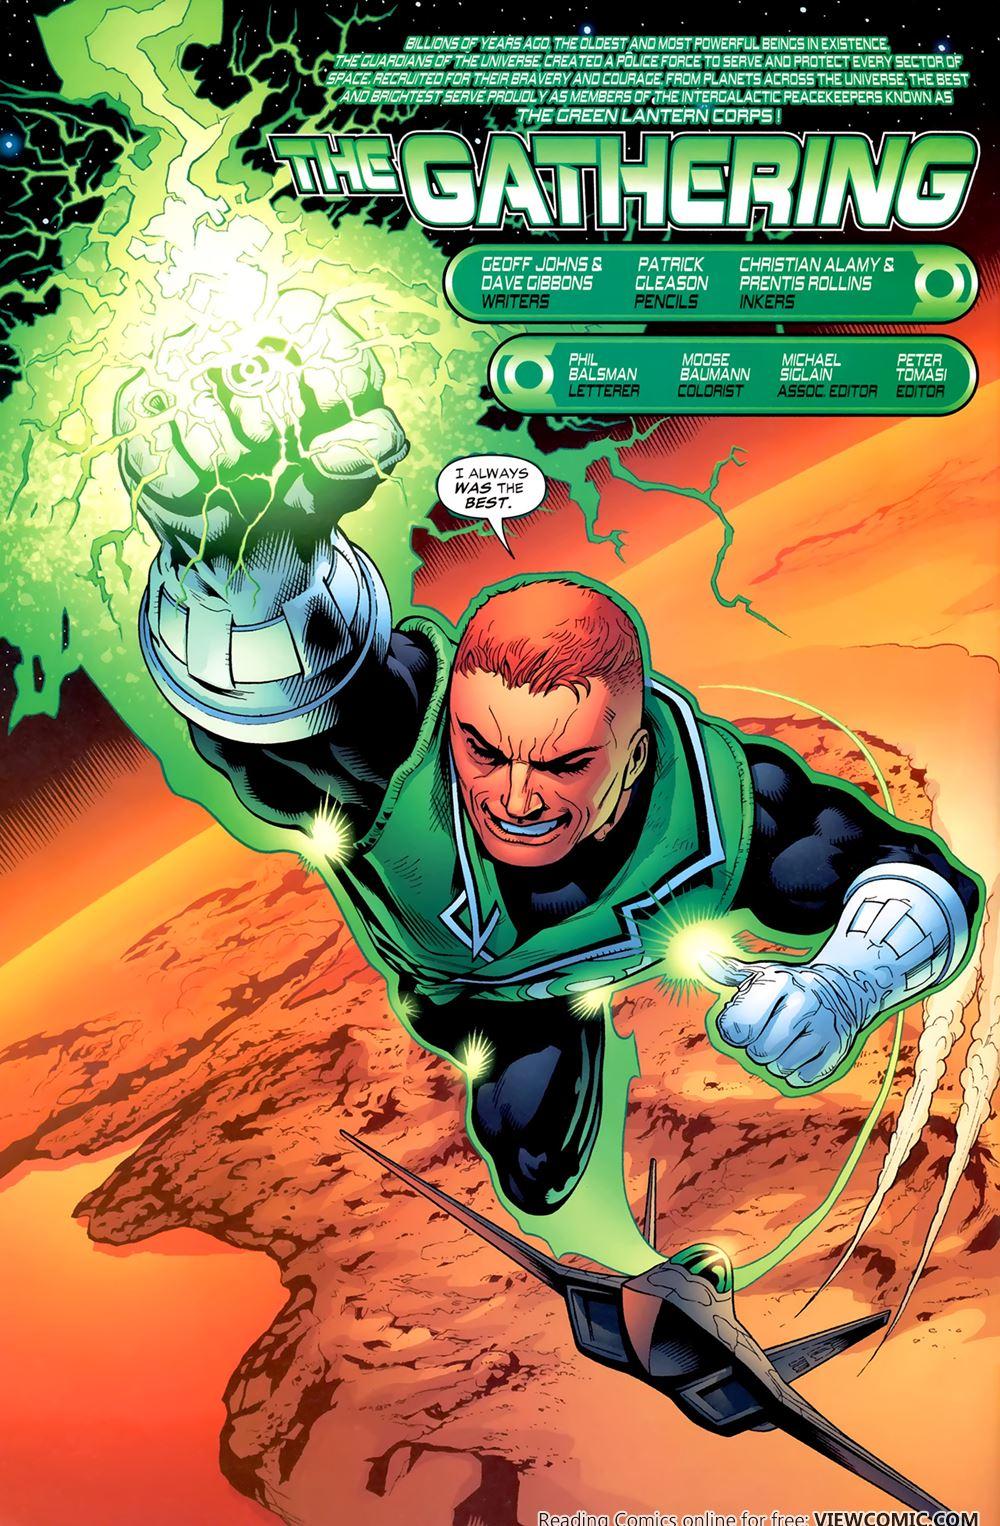 green lantern corps recharge 01 of 5 2005 reading comics